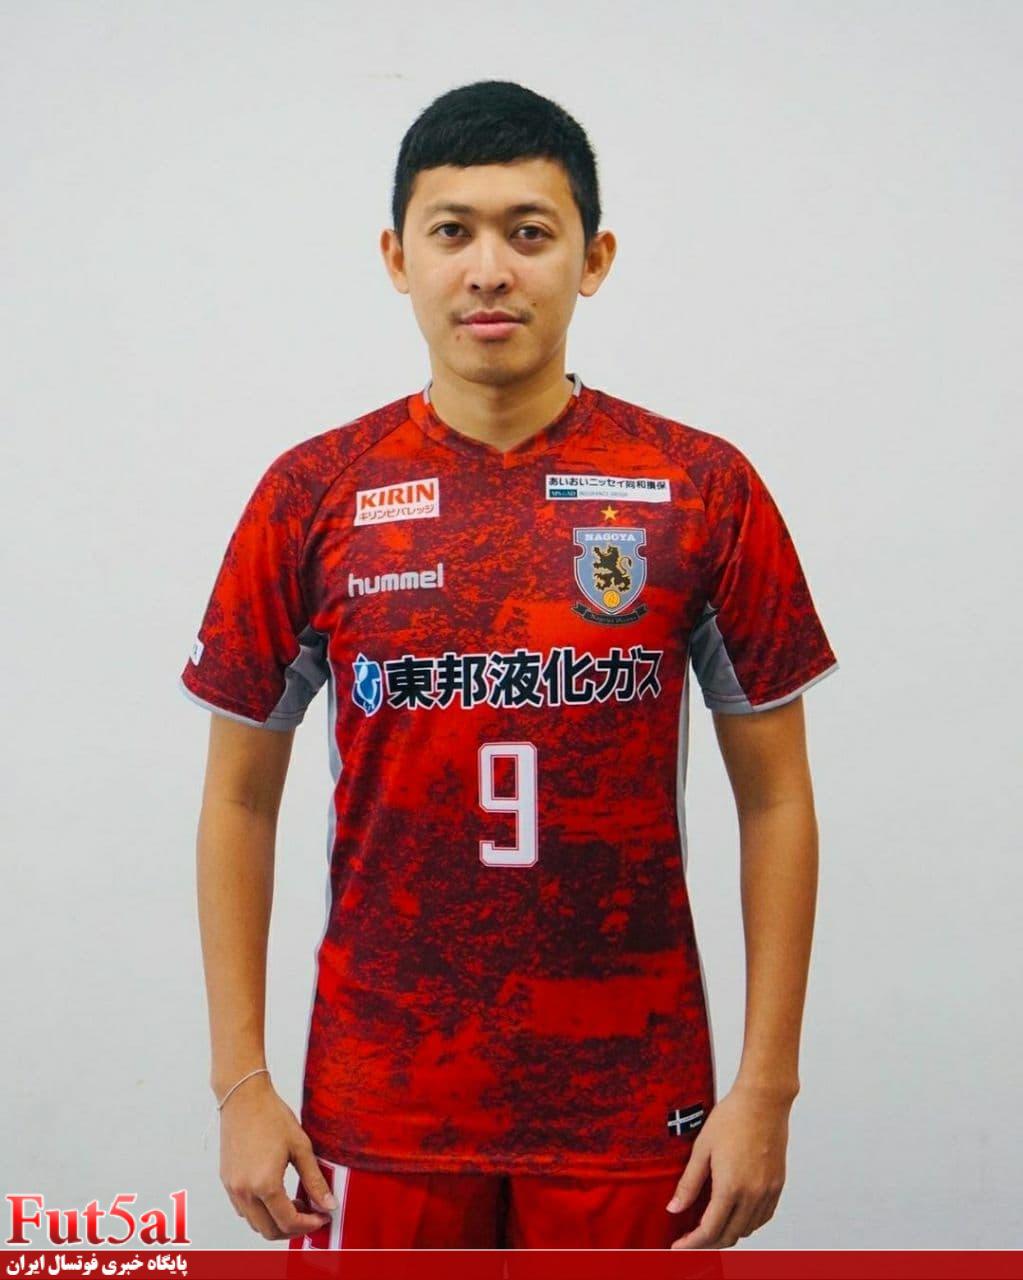 بازیکن اسبق مس سونگون به لیگ ژاپن پیوست